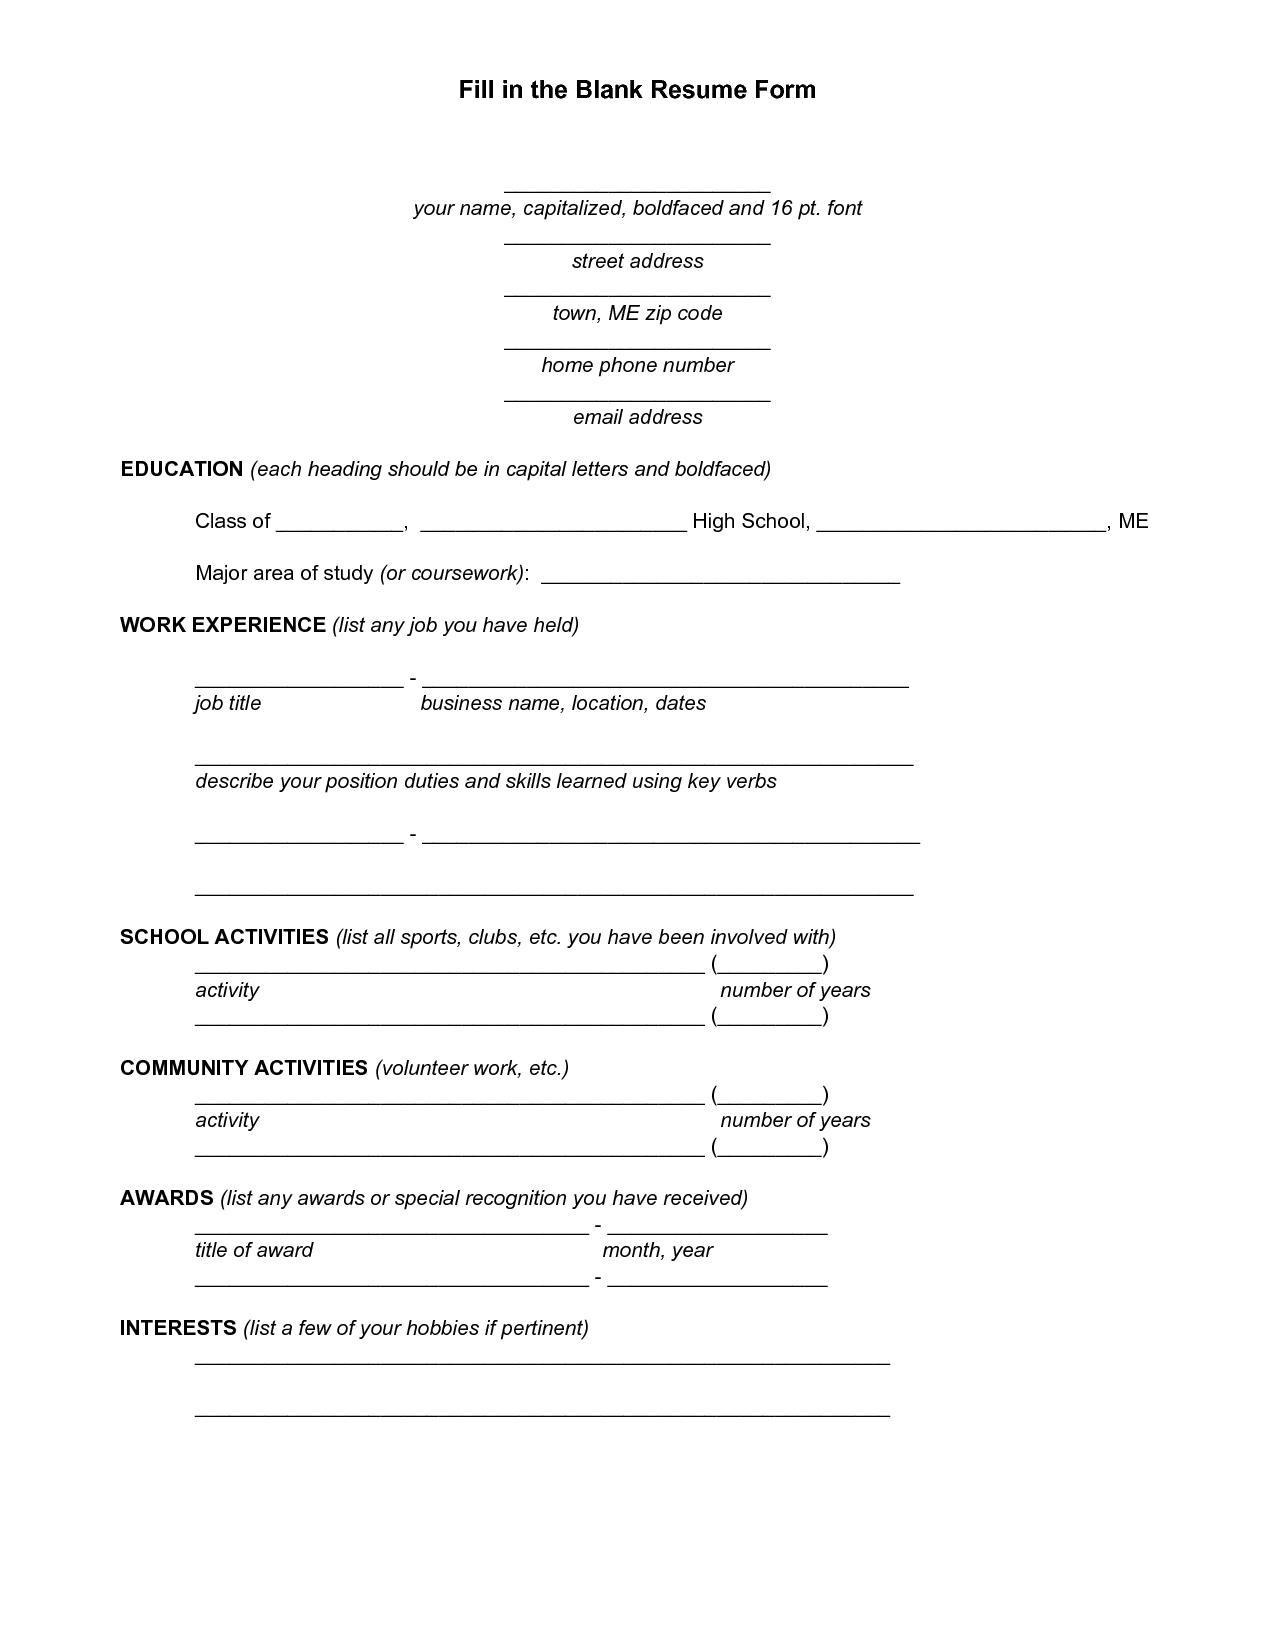 Free Printable Fill Blank Resume Templates